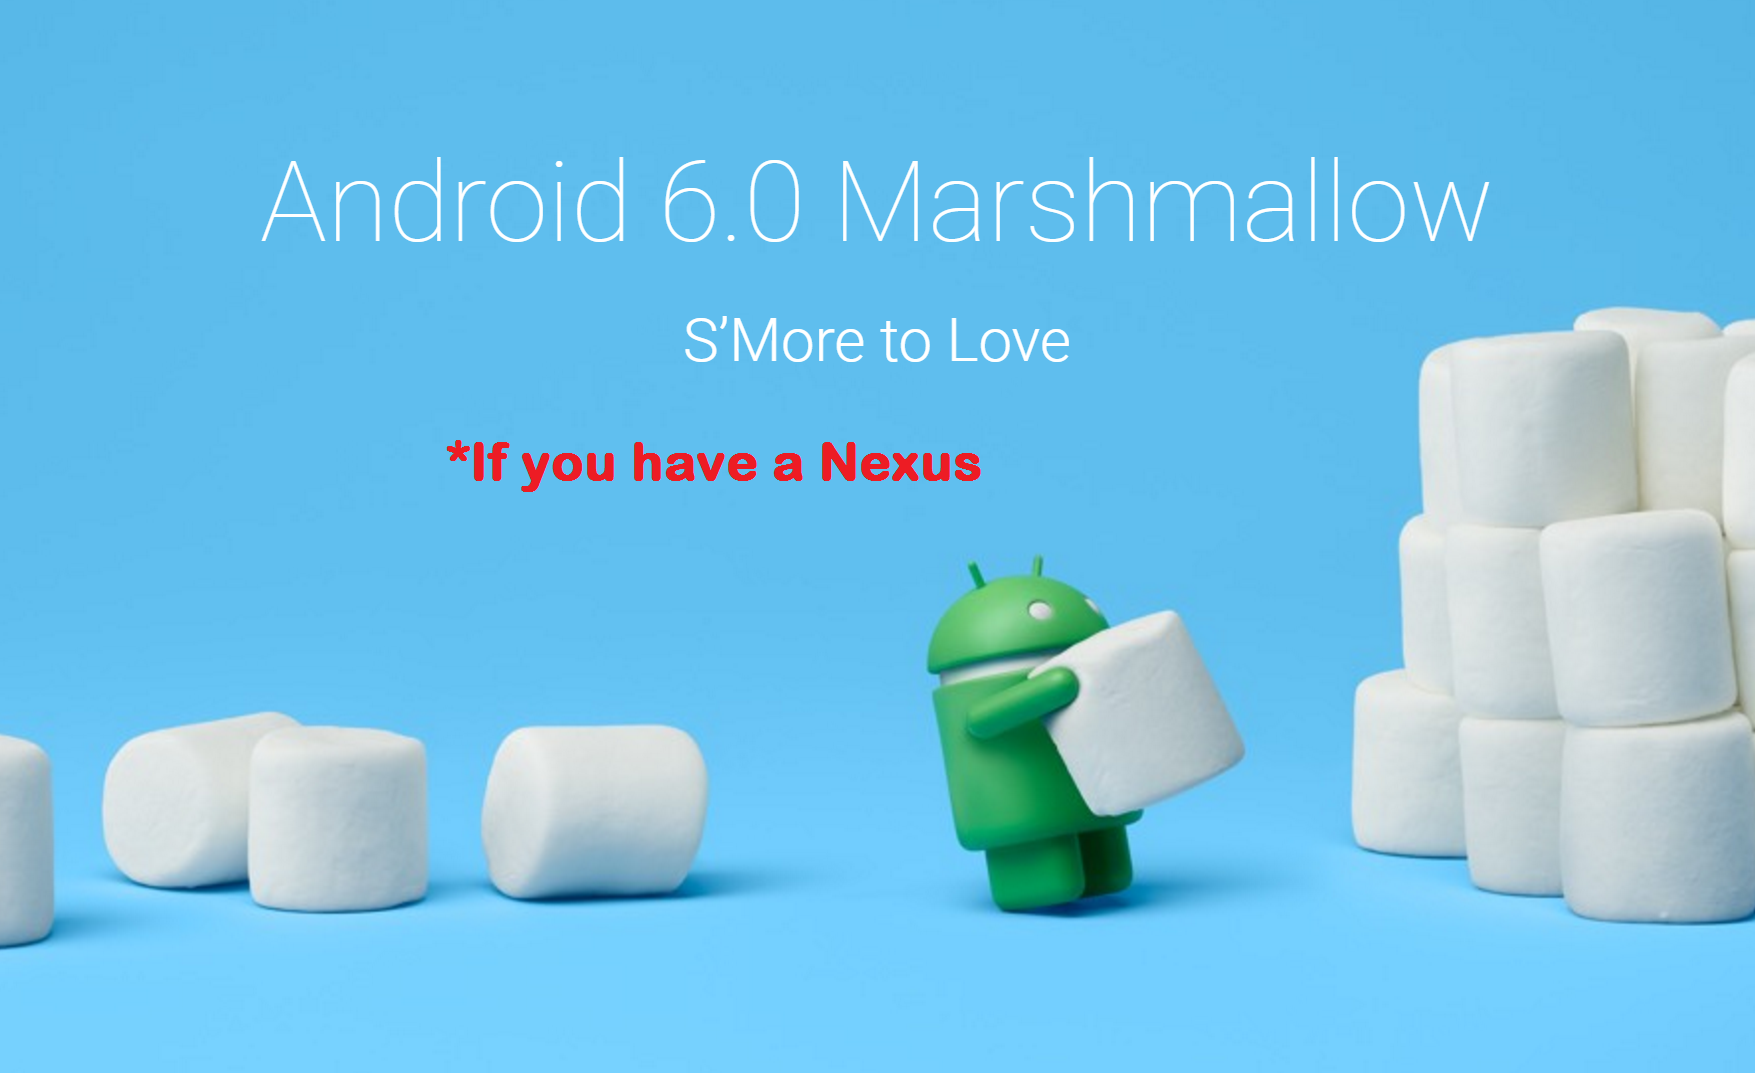 Marshmallow _image